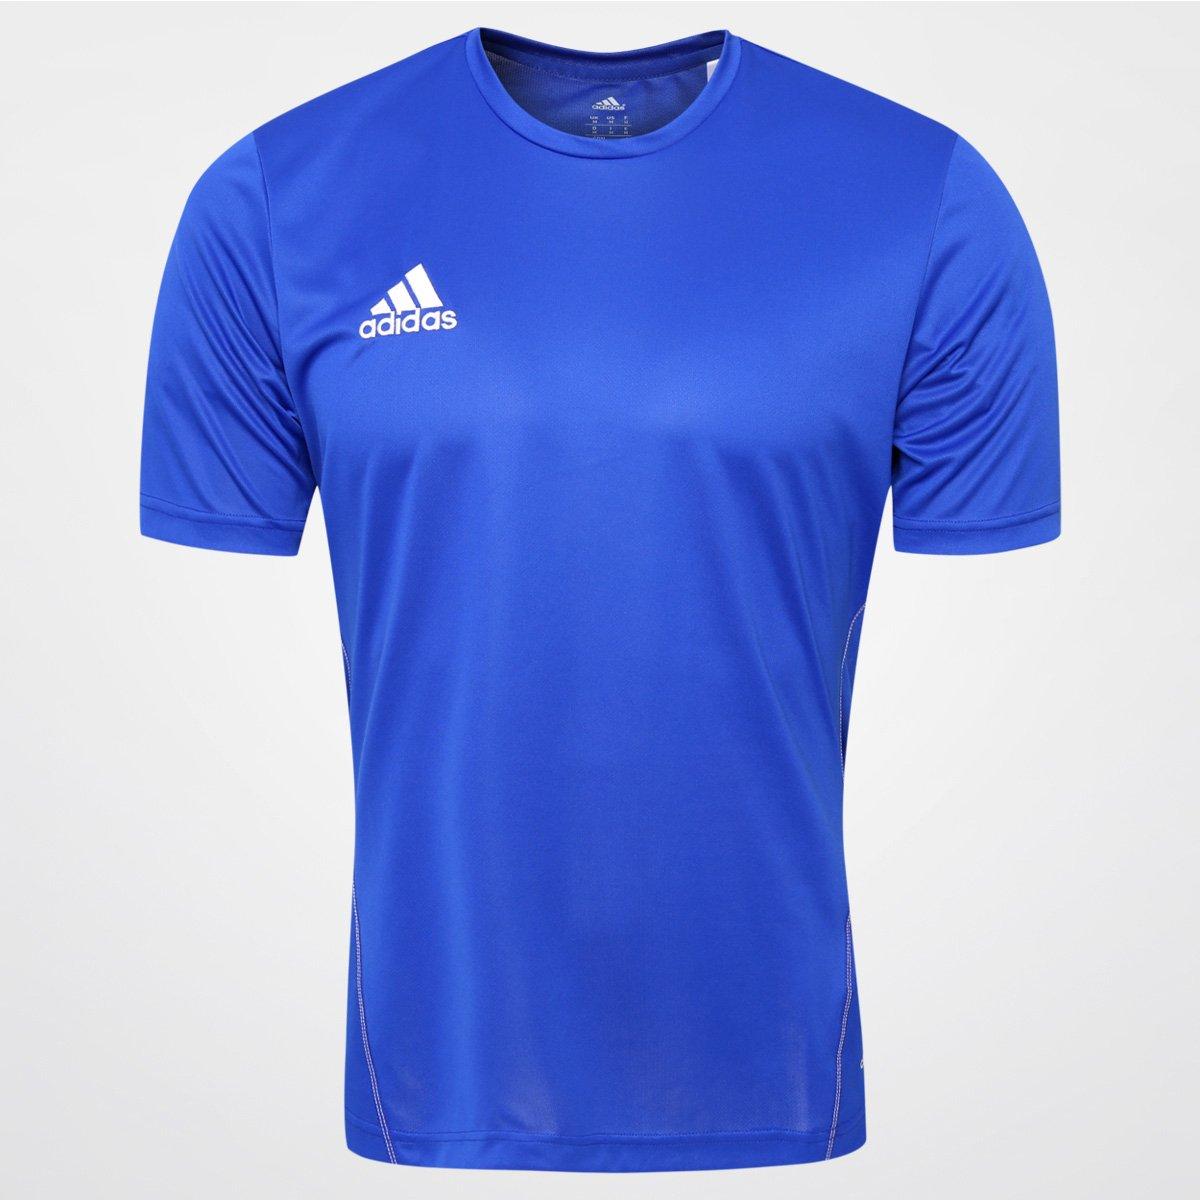 2e9cd3e029e Camisa Adidas Core 15 Treino Masculina - Compre Agora